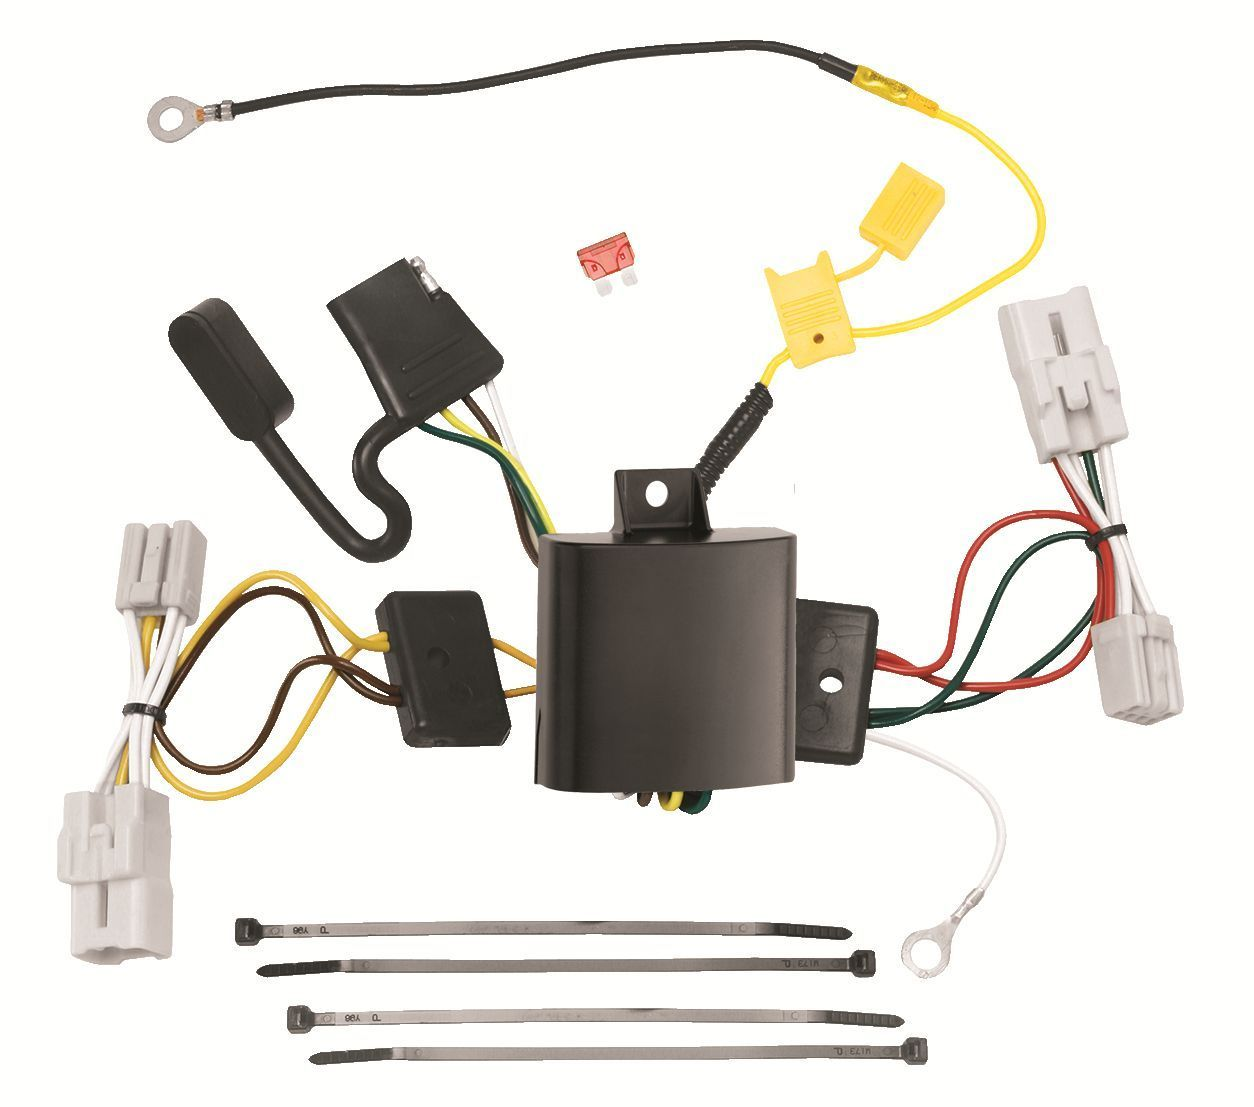 Trailer Wiring Harness Kit For 09-11 Hyundai Genesis 4 Dr. Sedan Plug & Play NEW